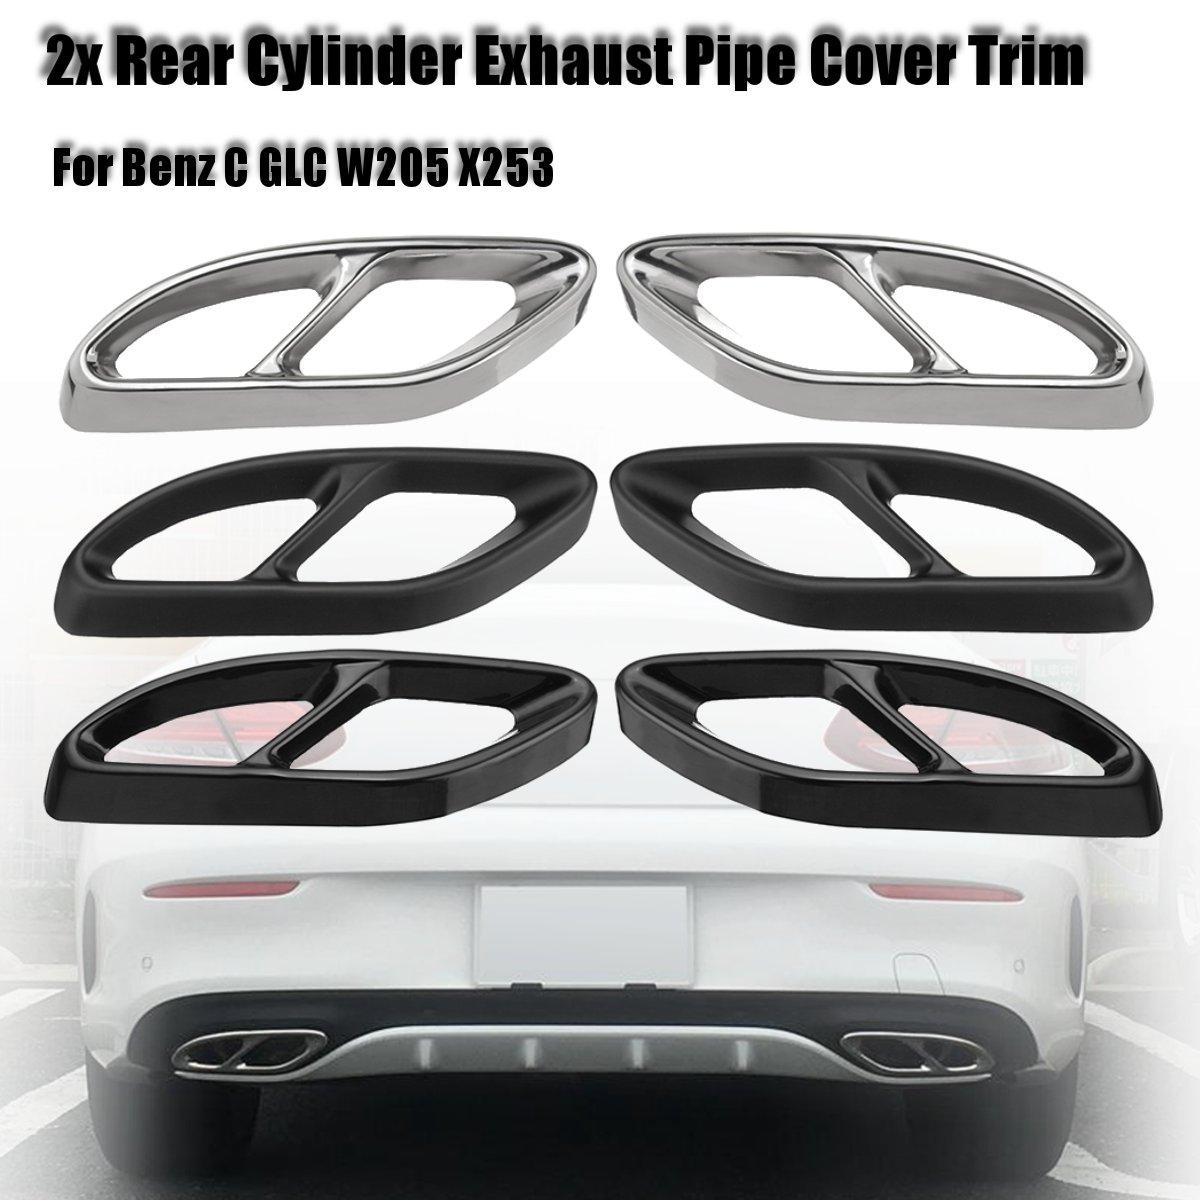 Karbon siyah araba arka çift egzoz boru çubuk oto egzoz susturucu Trim Benz C GLC W205 X253 2015 2016 2017 2018